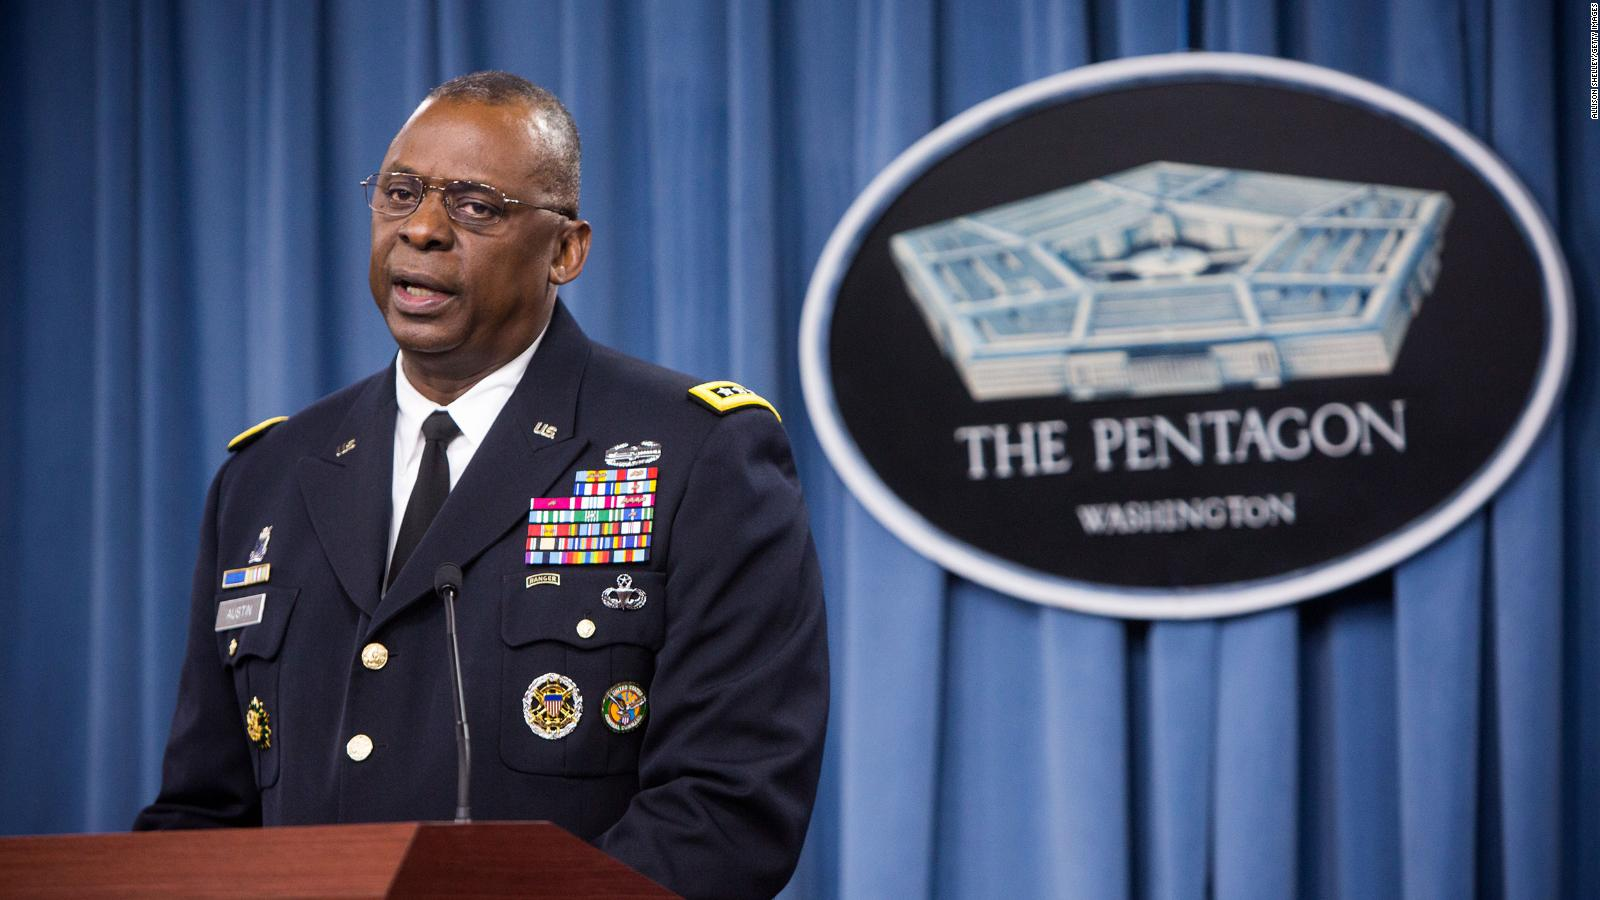 Biden Picks Retired Gen Lloyd Austin To Be His Secretary Of Defense Sources Say Cnnpolitics